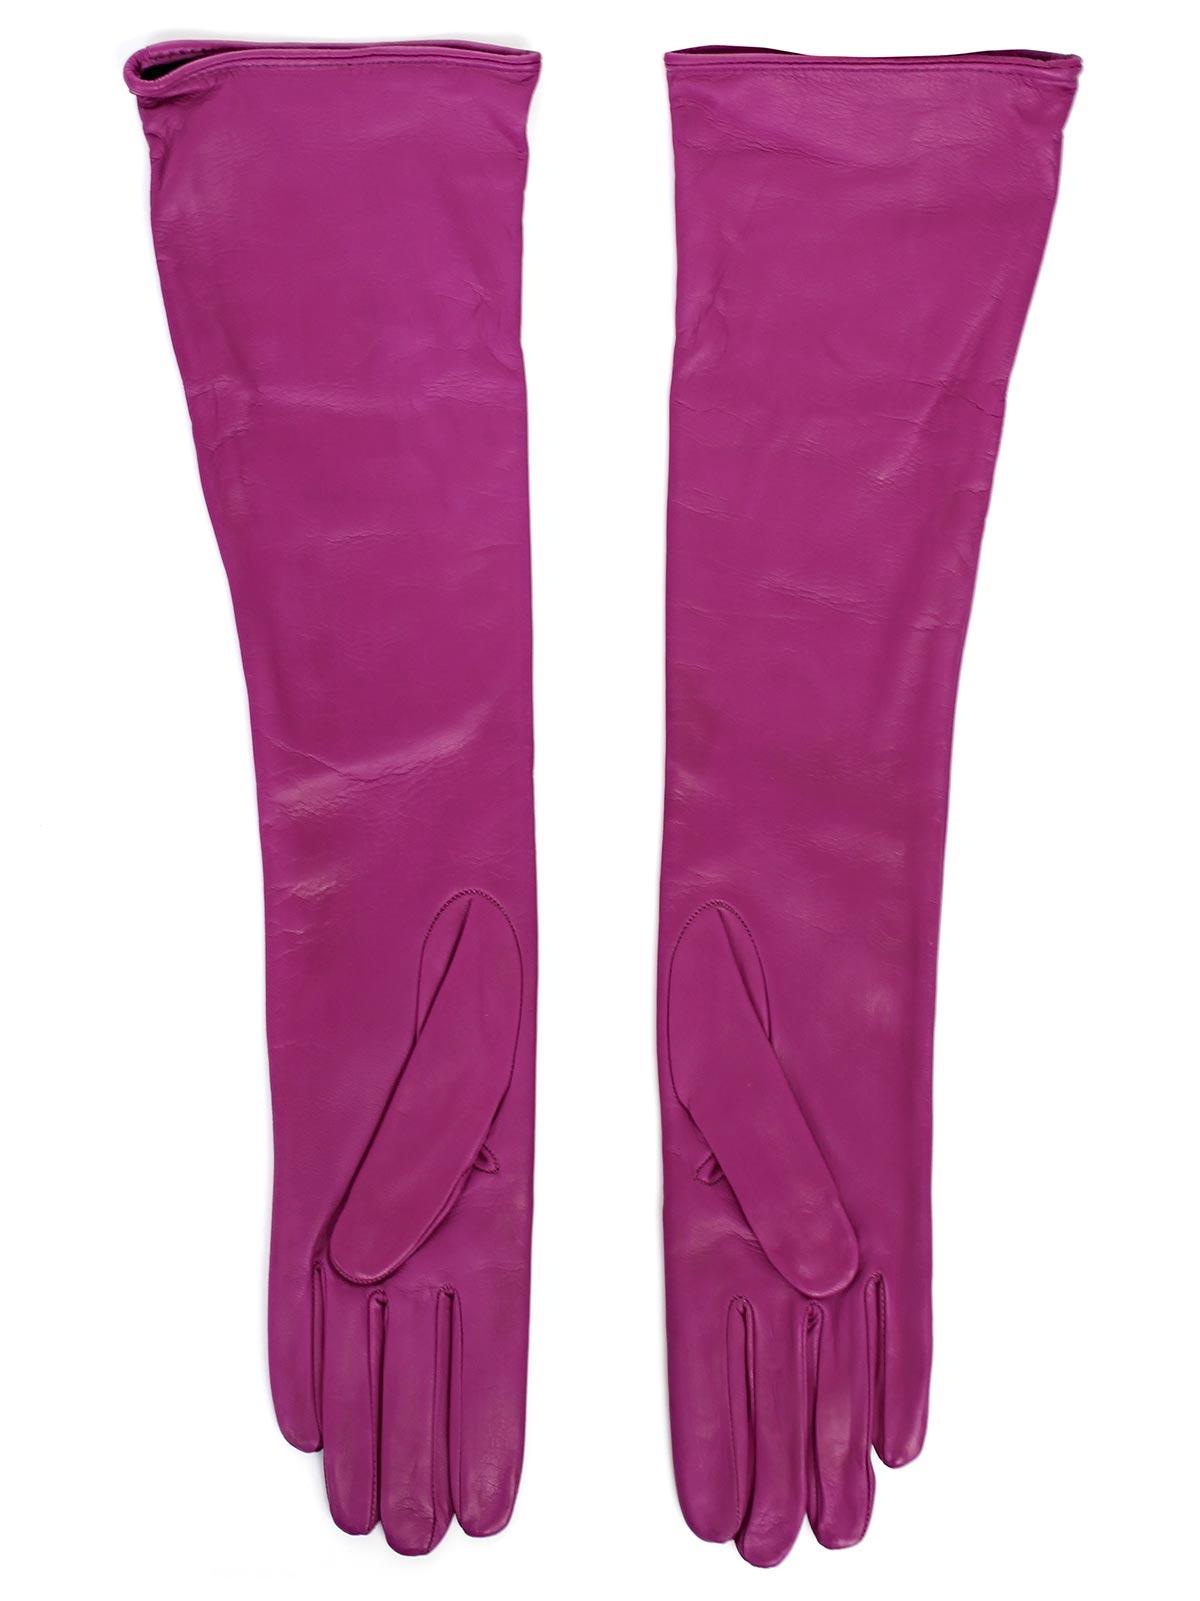 Picture of Erika Cavallini Gloves